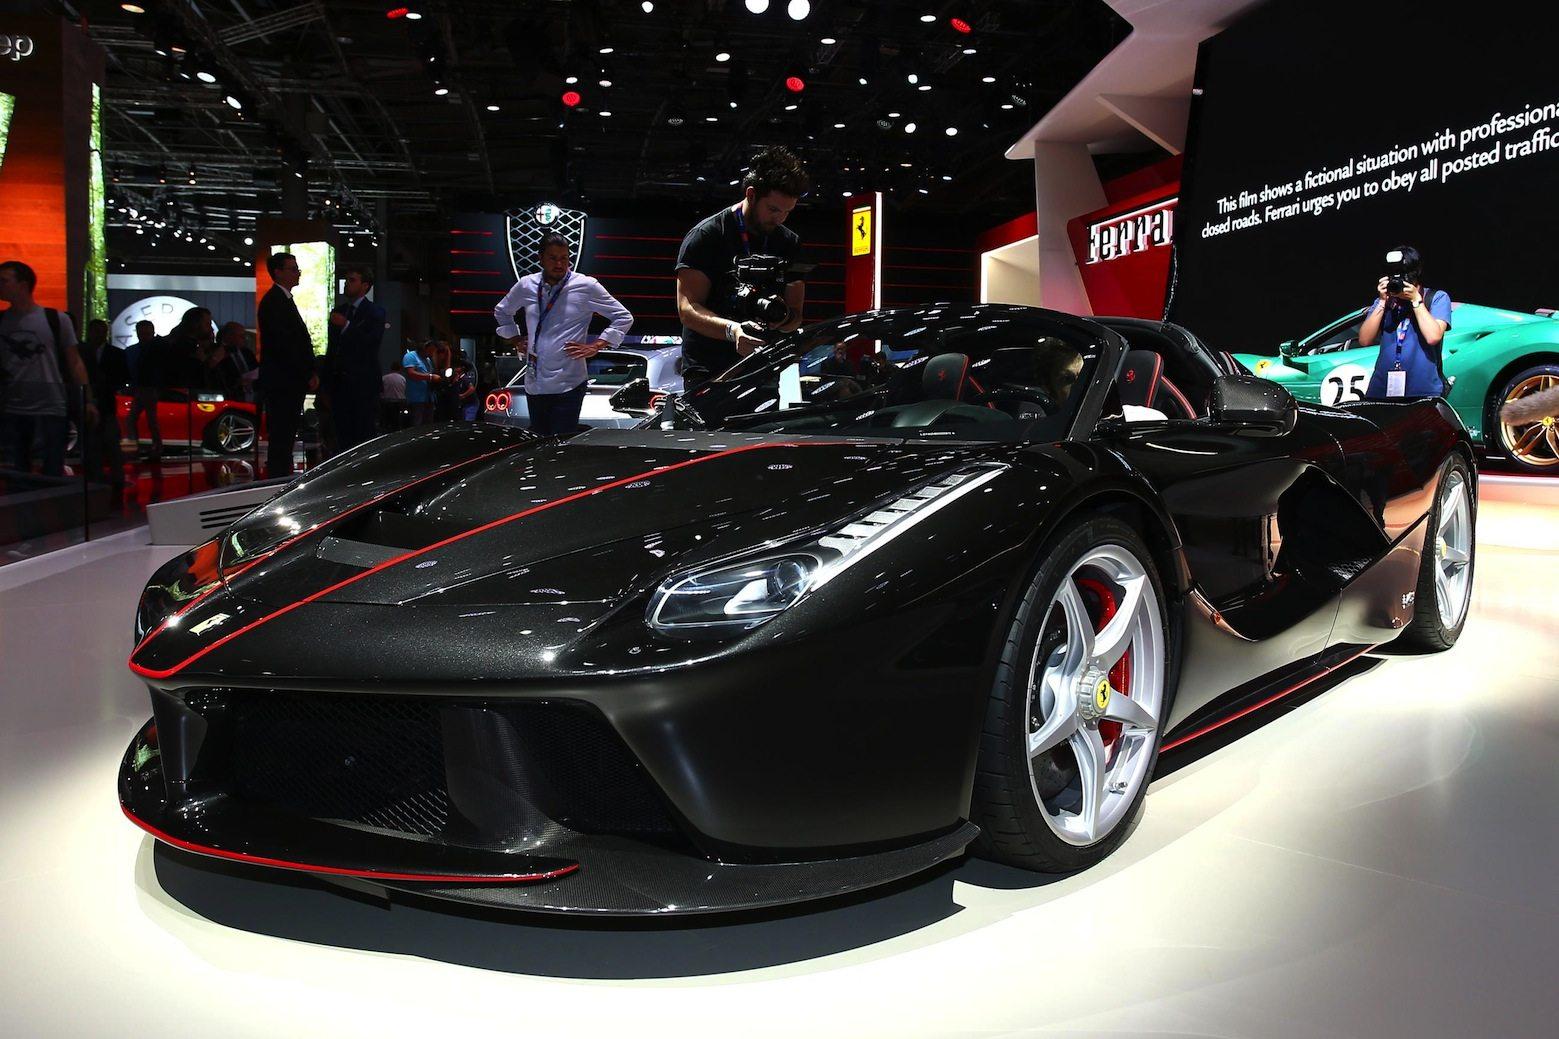 Parigi, svelata la nuova Ferrari GTC4Lusso T